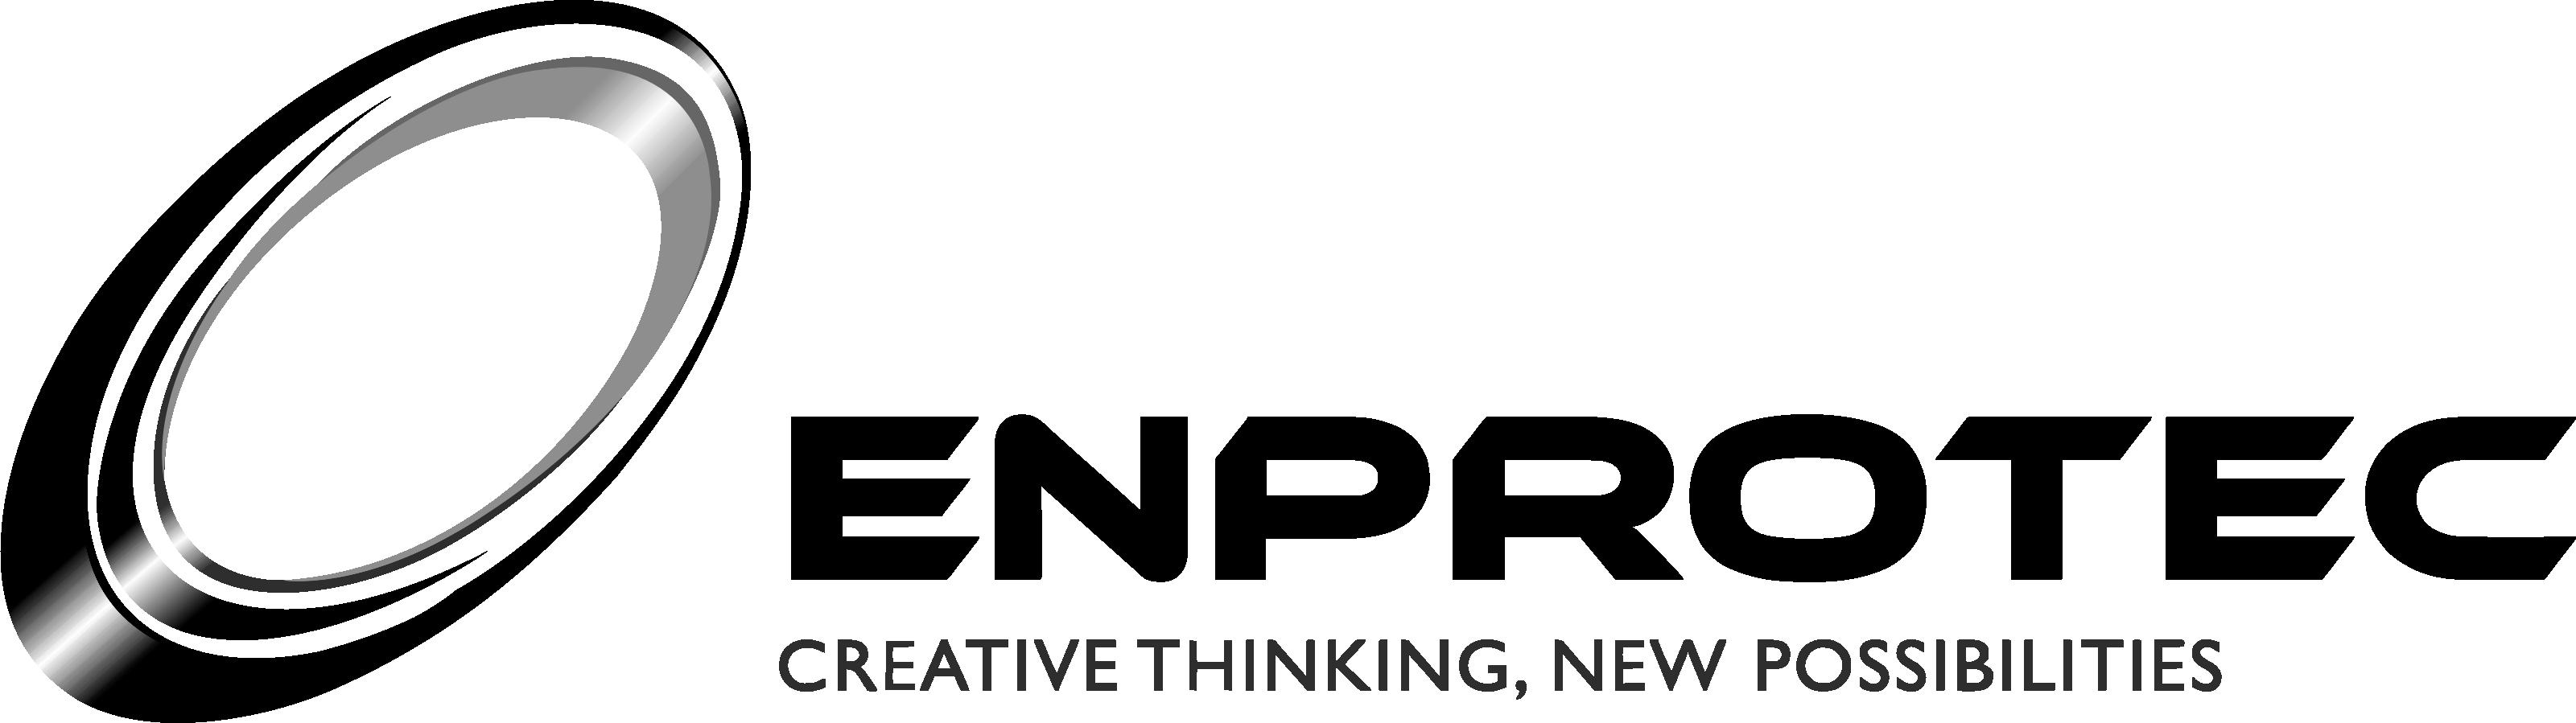 Enprotec-Logo